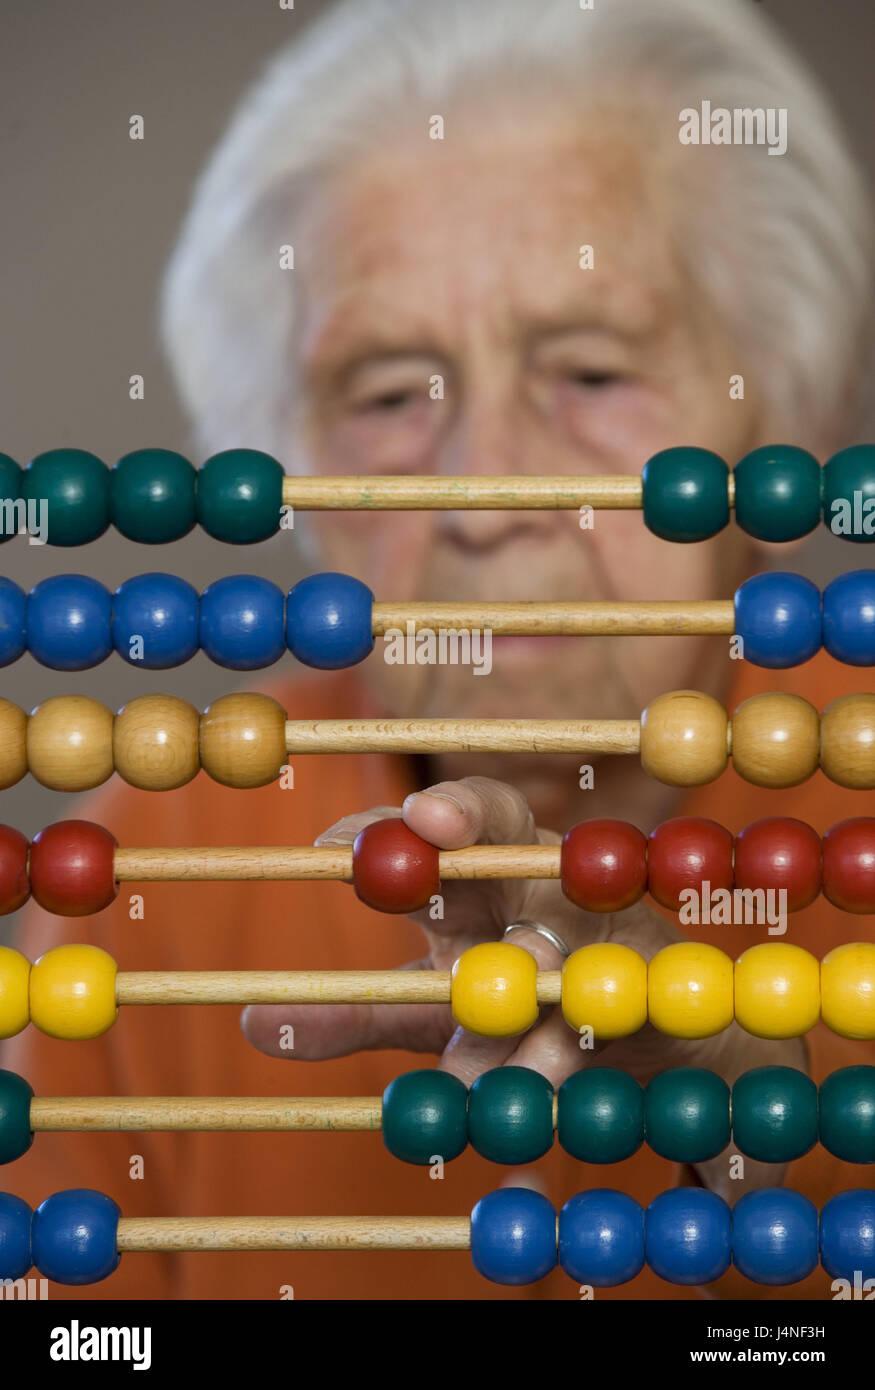 Senior, slide rule, concentration, portrait, curled, blur, person, pensioner, woman, arithmetic practise, arithmetic - Stock Image